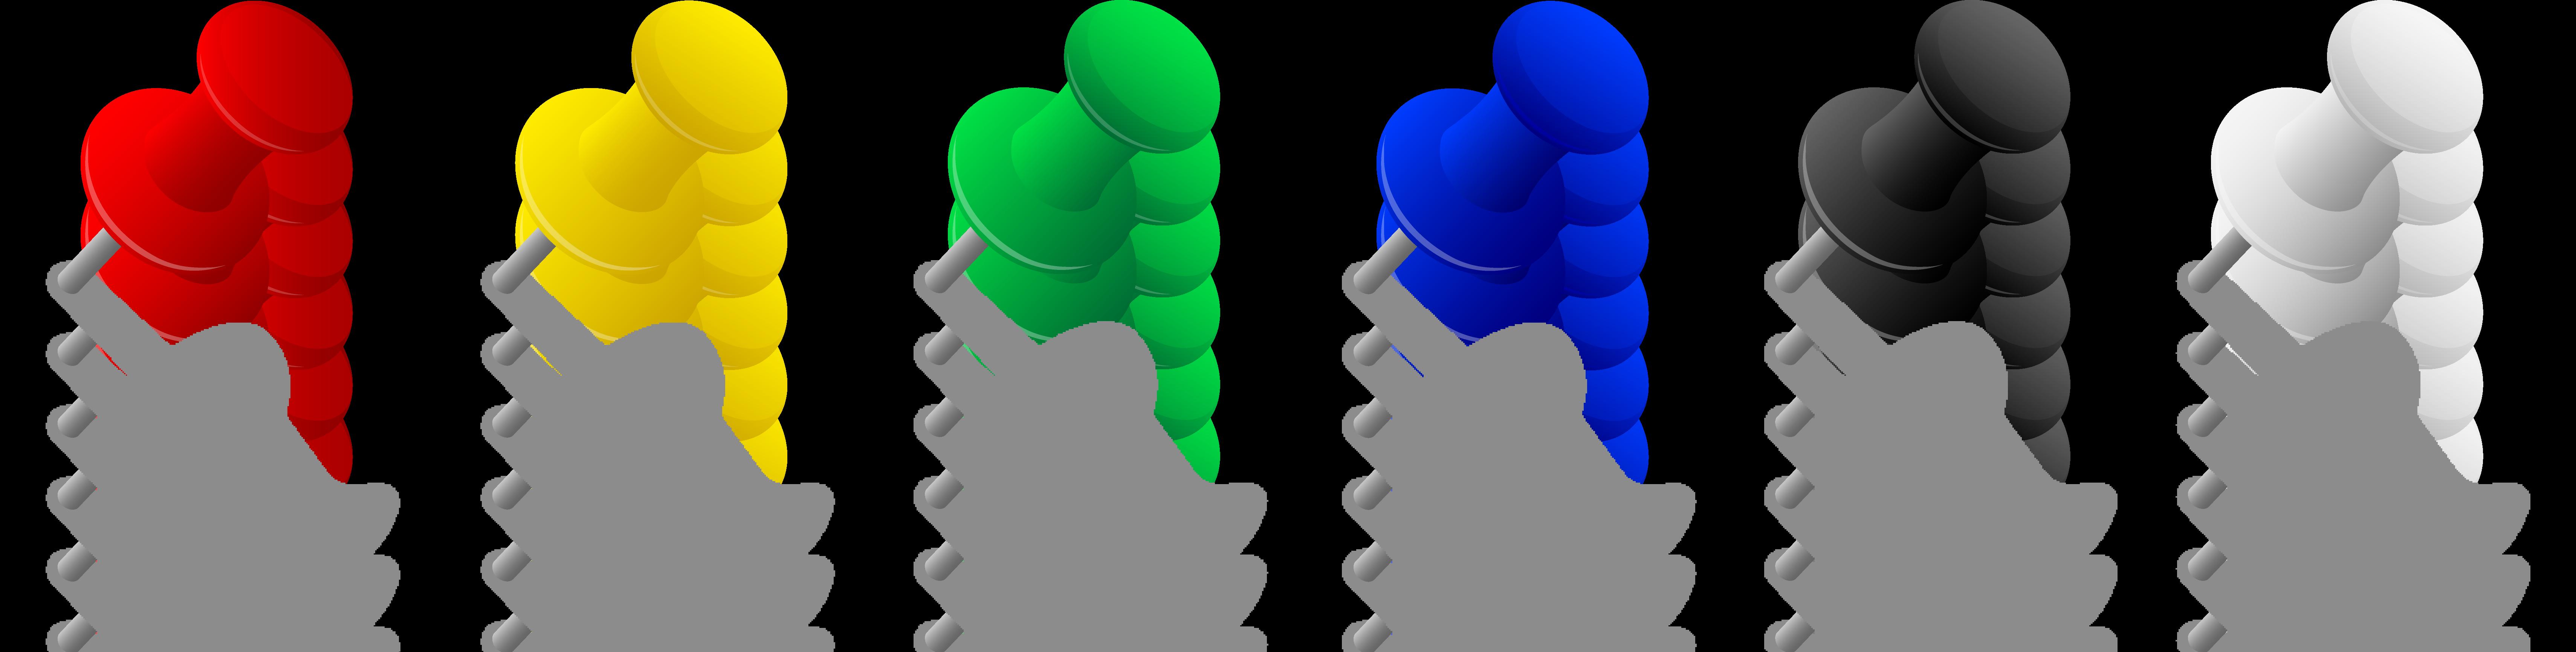 Push Pin Clip Clipart-Push pin clip clipart-5